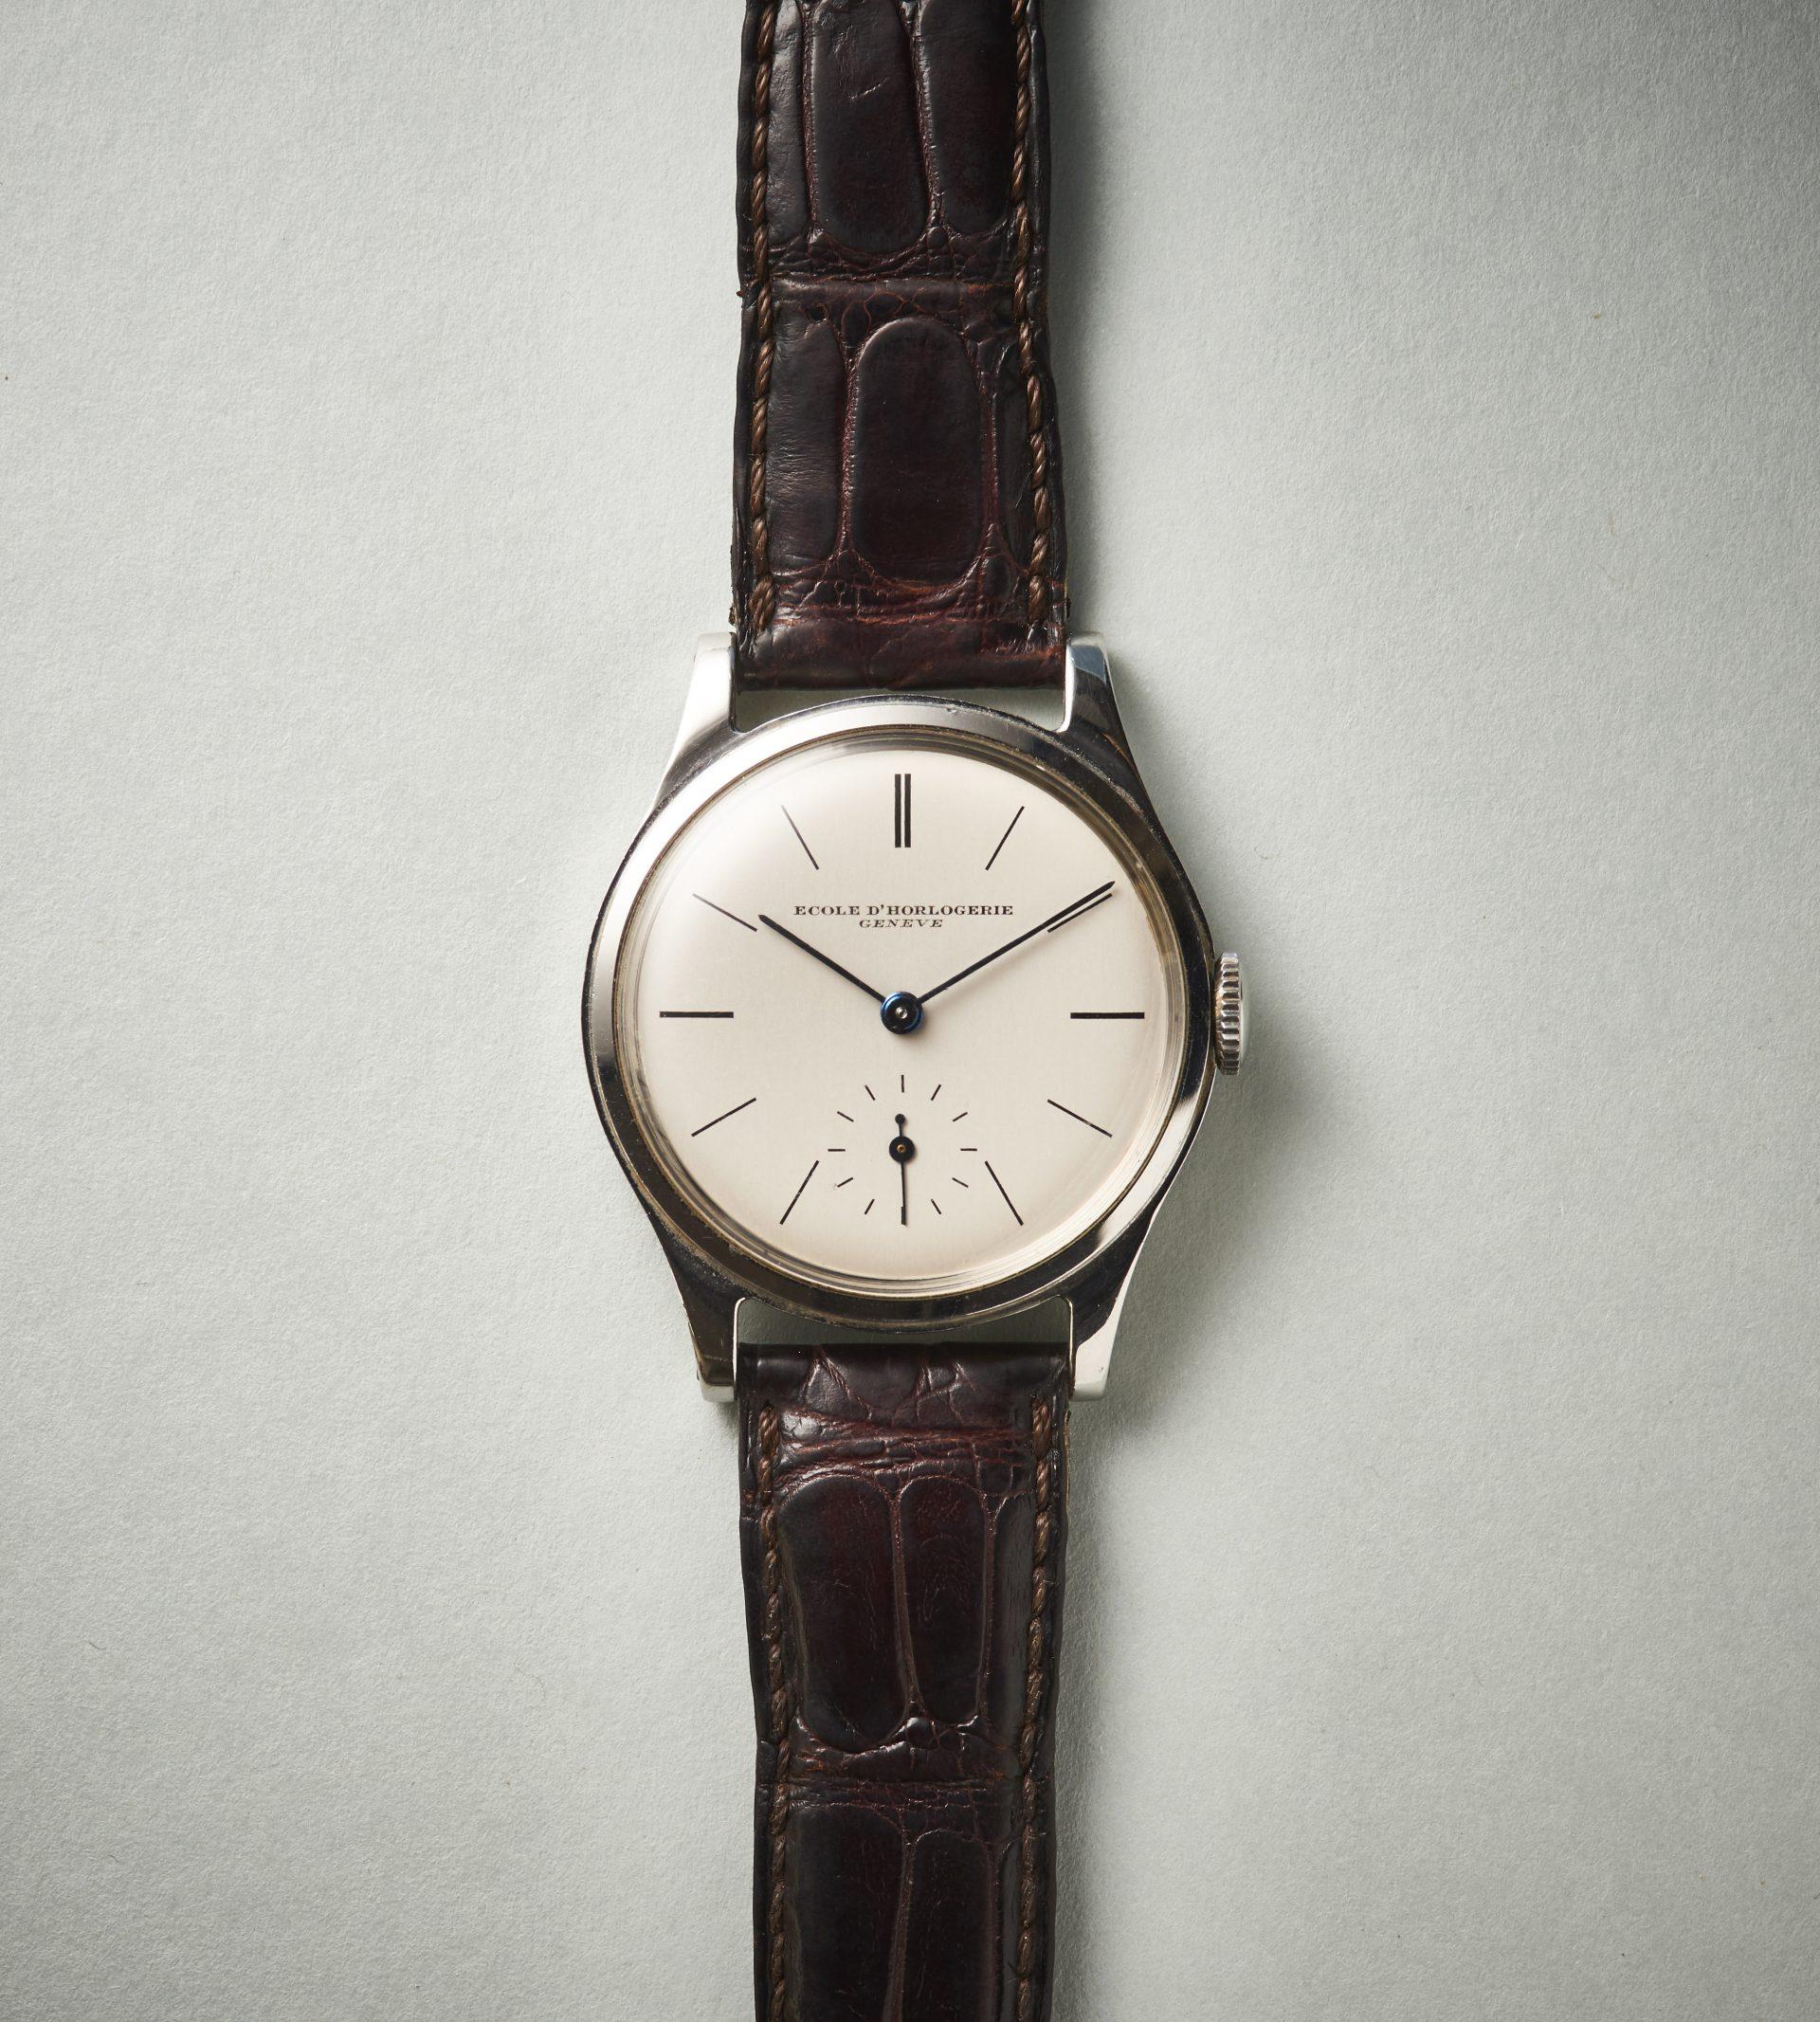 Ecole dHorlogerie Geneve Patek Philippe Ref 2509 Gesicht Uhrenkosmos BU 11334